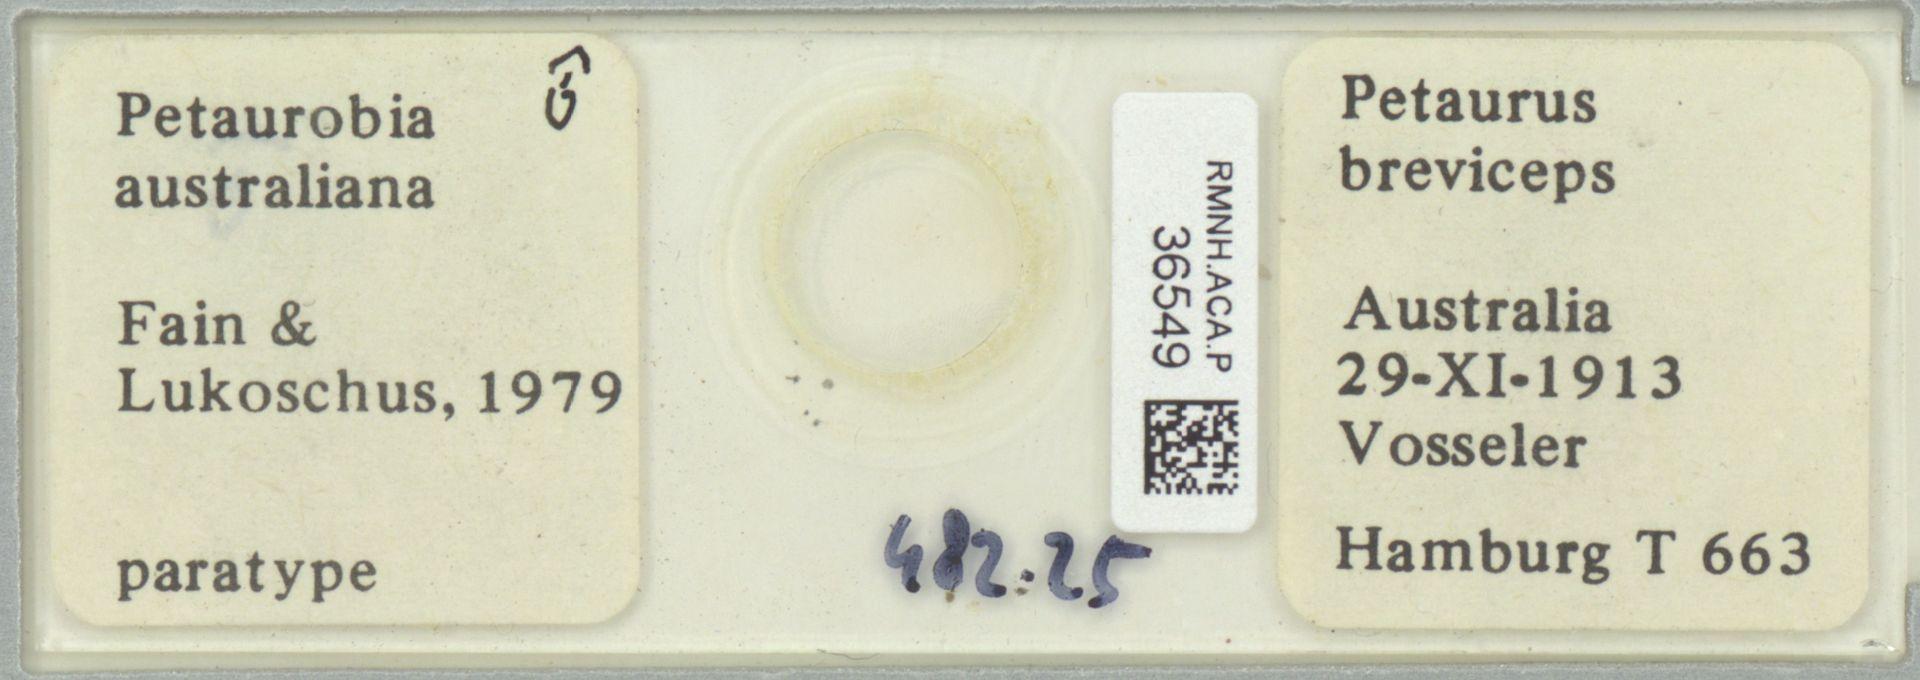 RMNH.ACA.P.36549   Petaurobia australiana Fain & Lukoschus, 1979